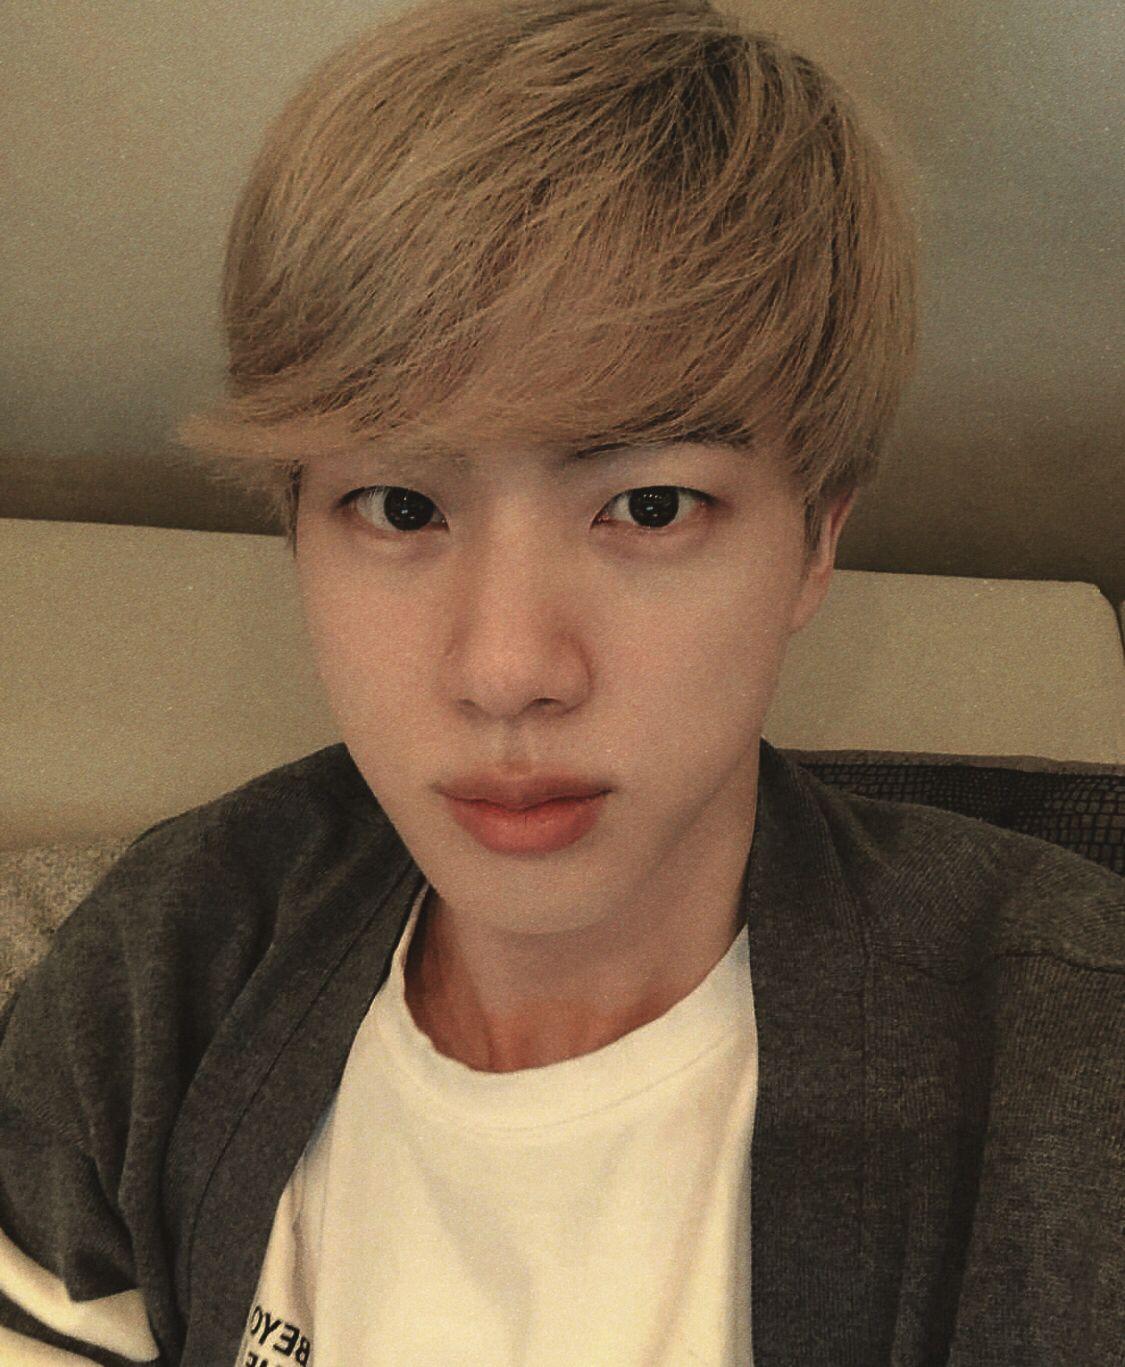 Seokjin Jin Bts Bangtanboys Korean Kpop Idol Selca Seokjin Bangtan Boys Kpop